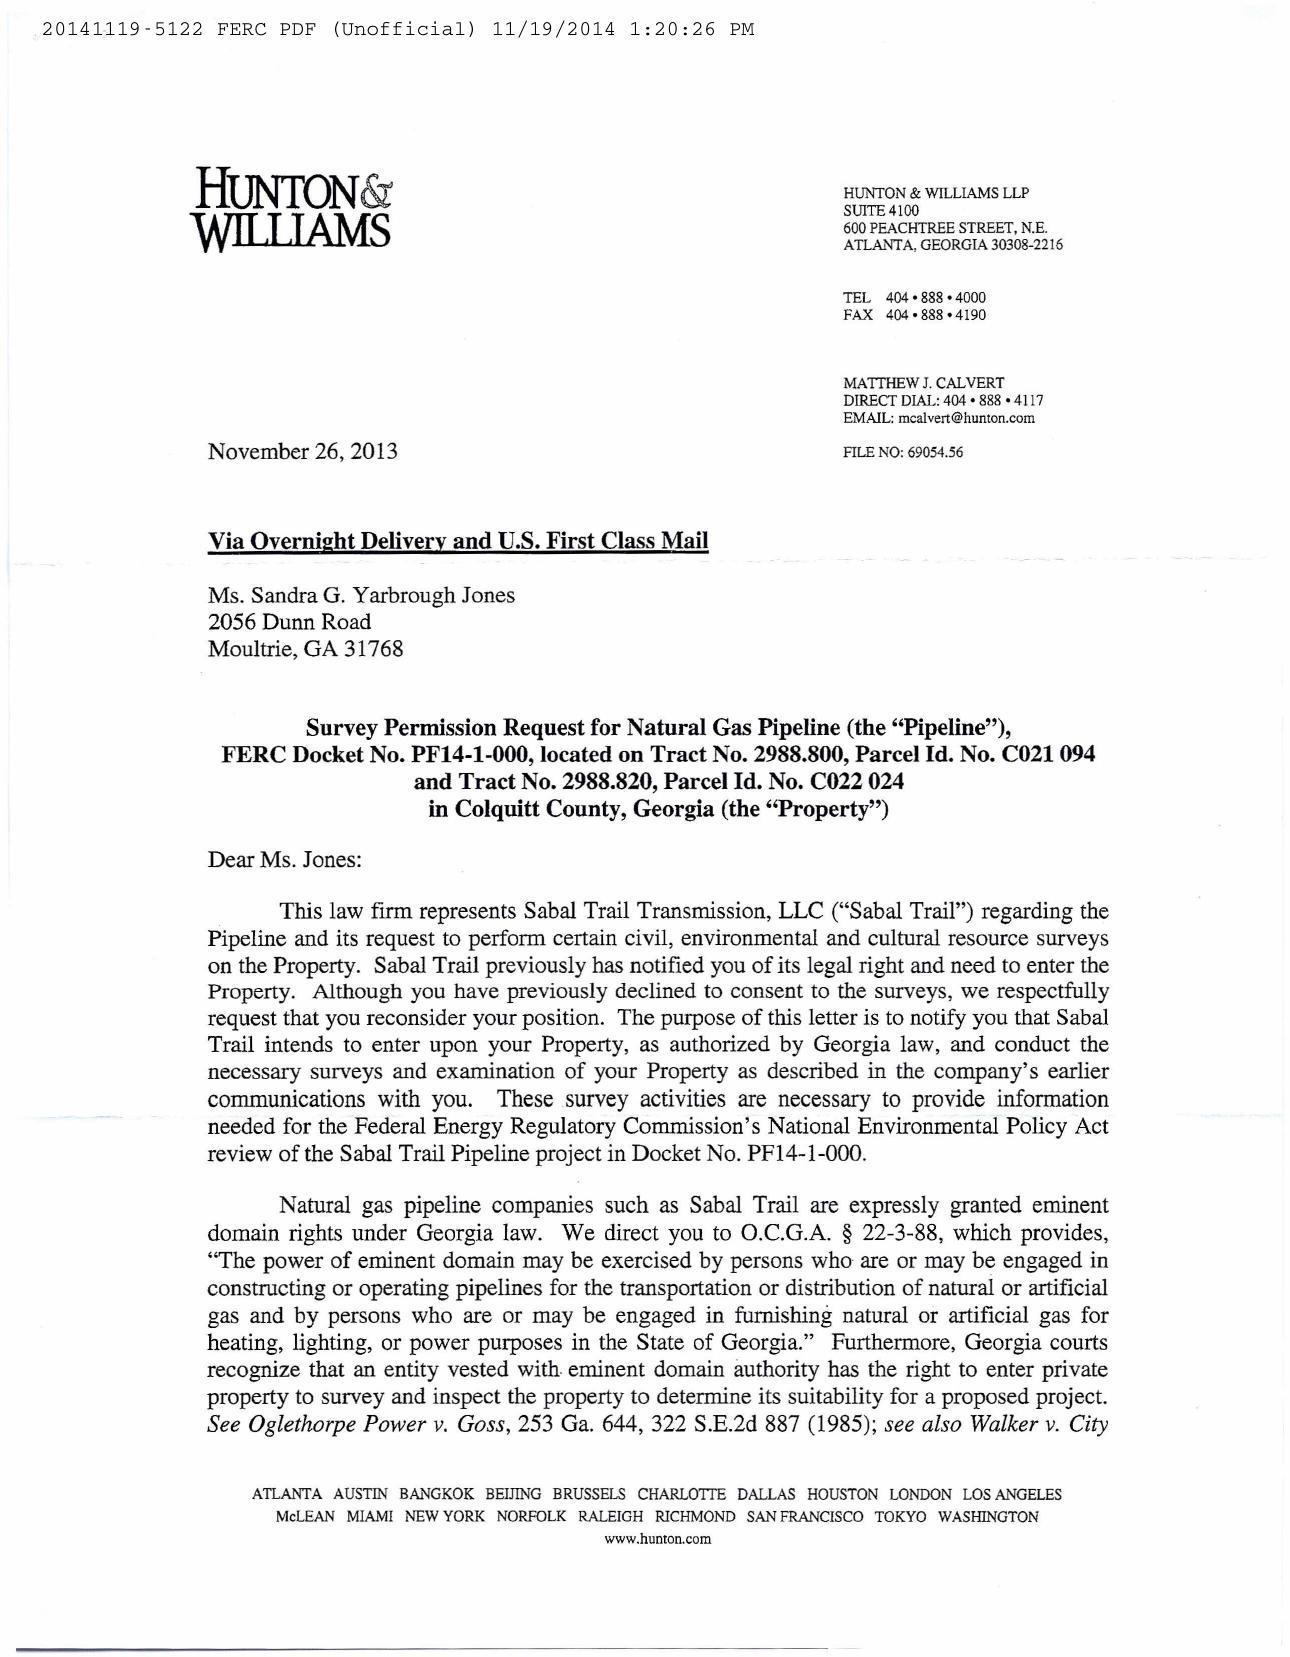 1290x1657 2013-11-26 Hunton & Williams to Sandra Jones (1 of 2), in Jones, by Sandra Jones, for SpectraBusters.org, 19 November 2014